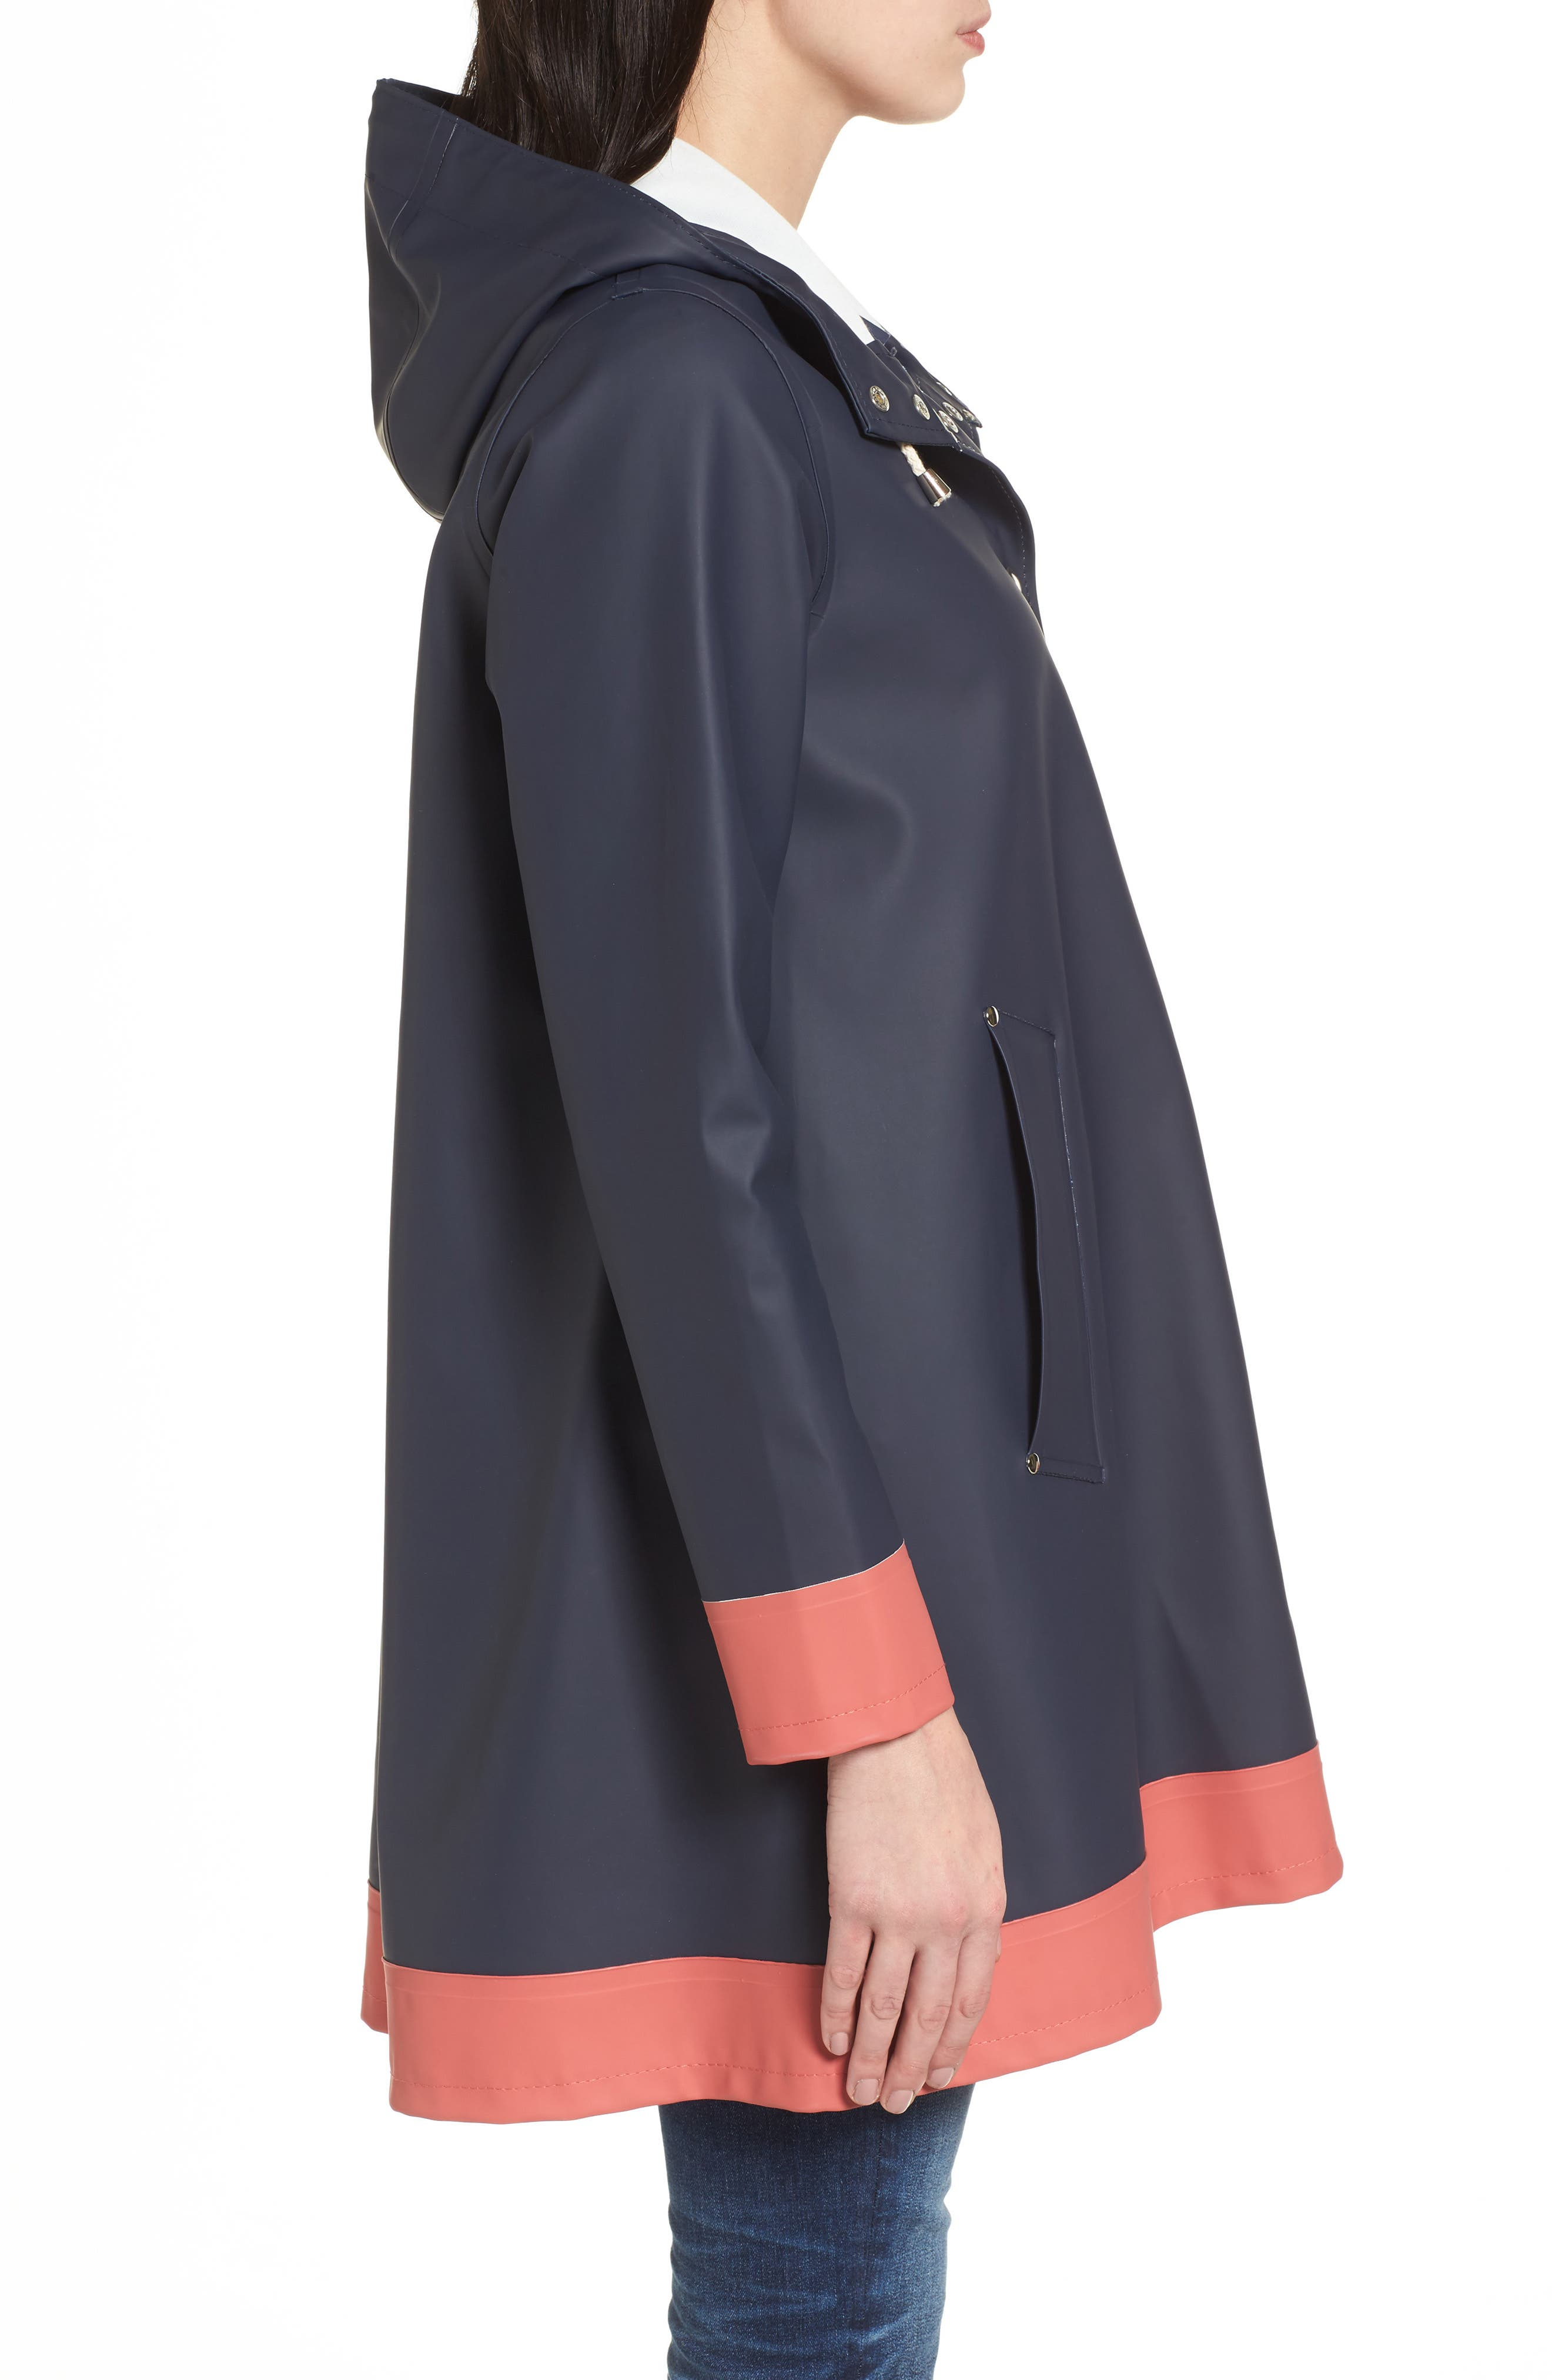 Mosebacke Frame Colorblock Raincoat,                             Alternate thumbnail 3, color,                             Navy/ Faded Rose